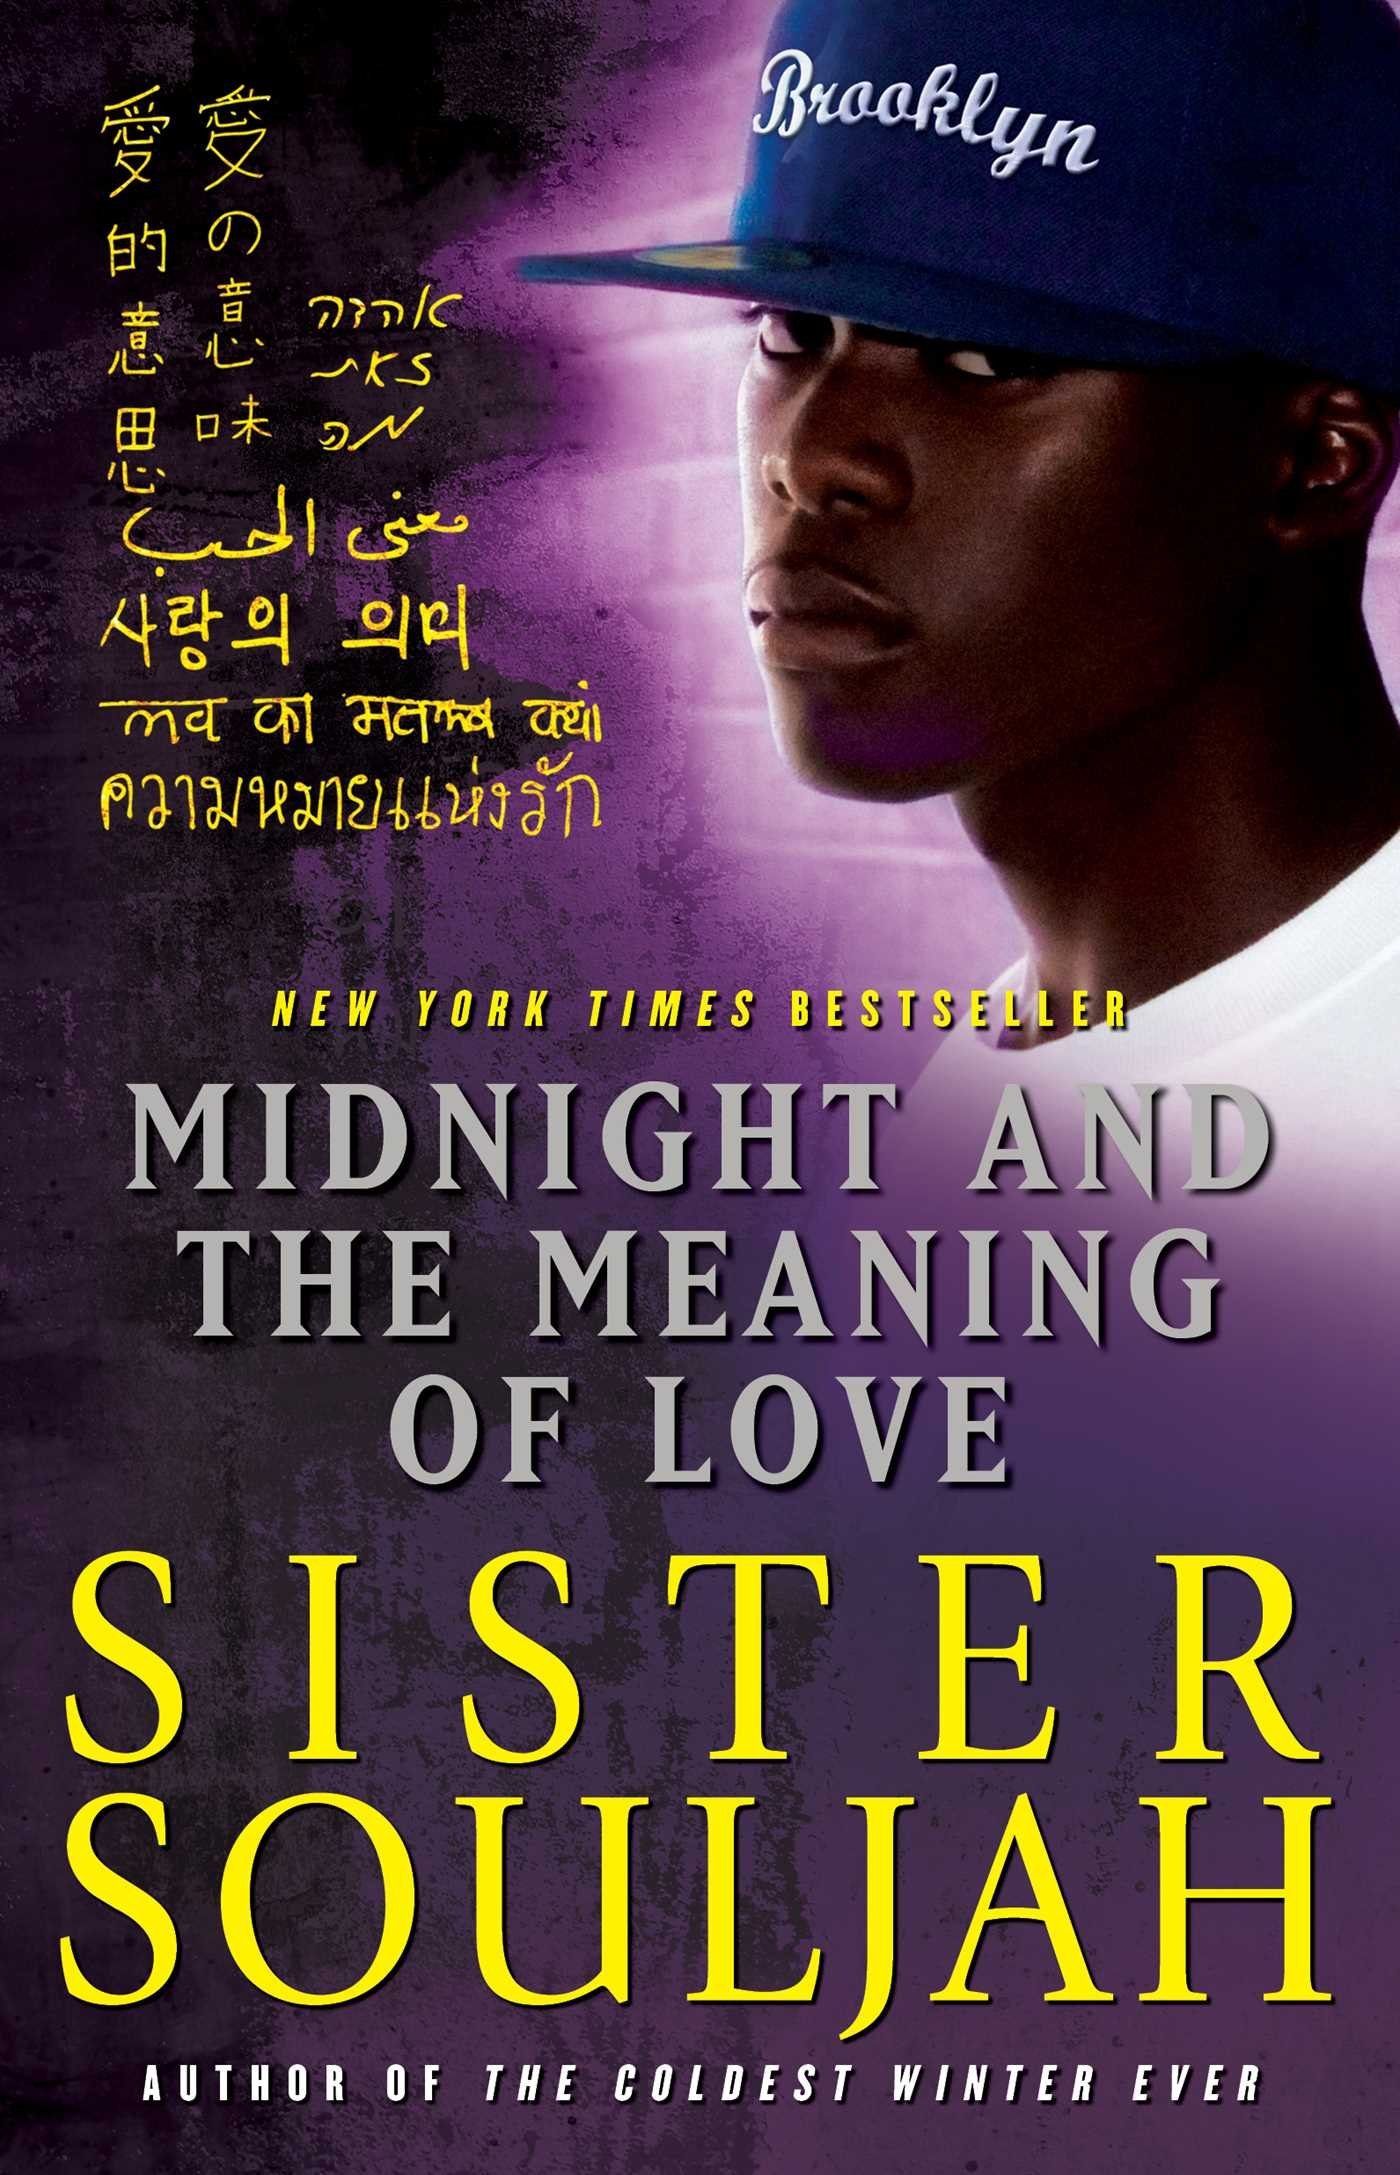 SISTER SOULJAH MIDNIGHT EBOOK